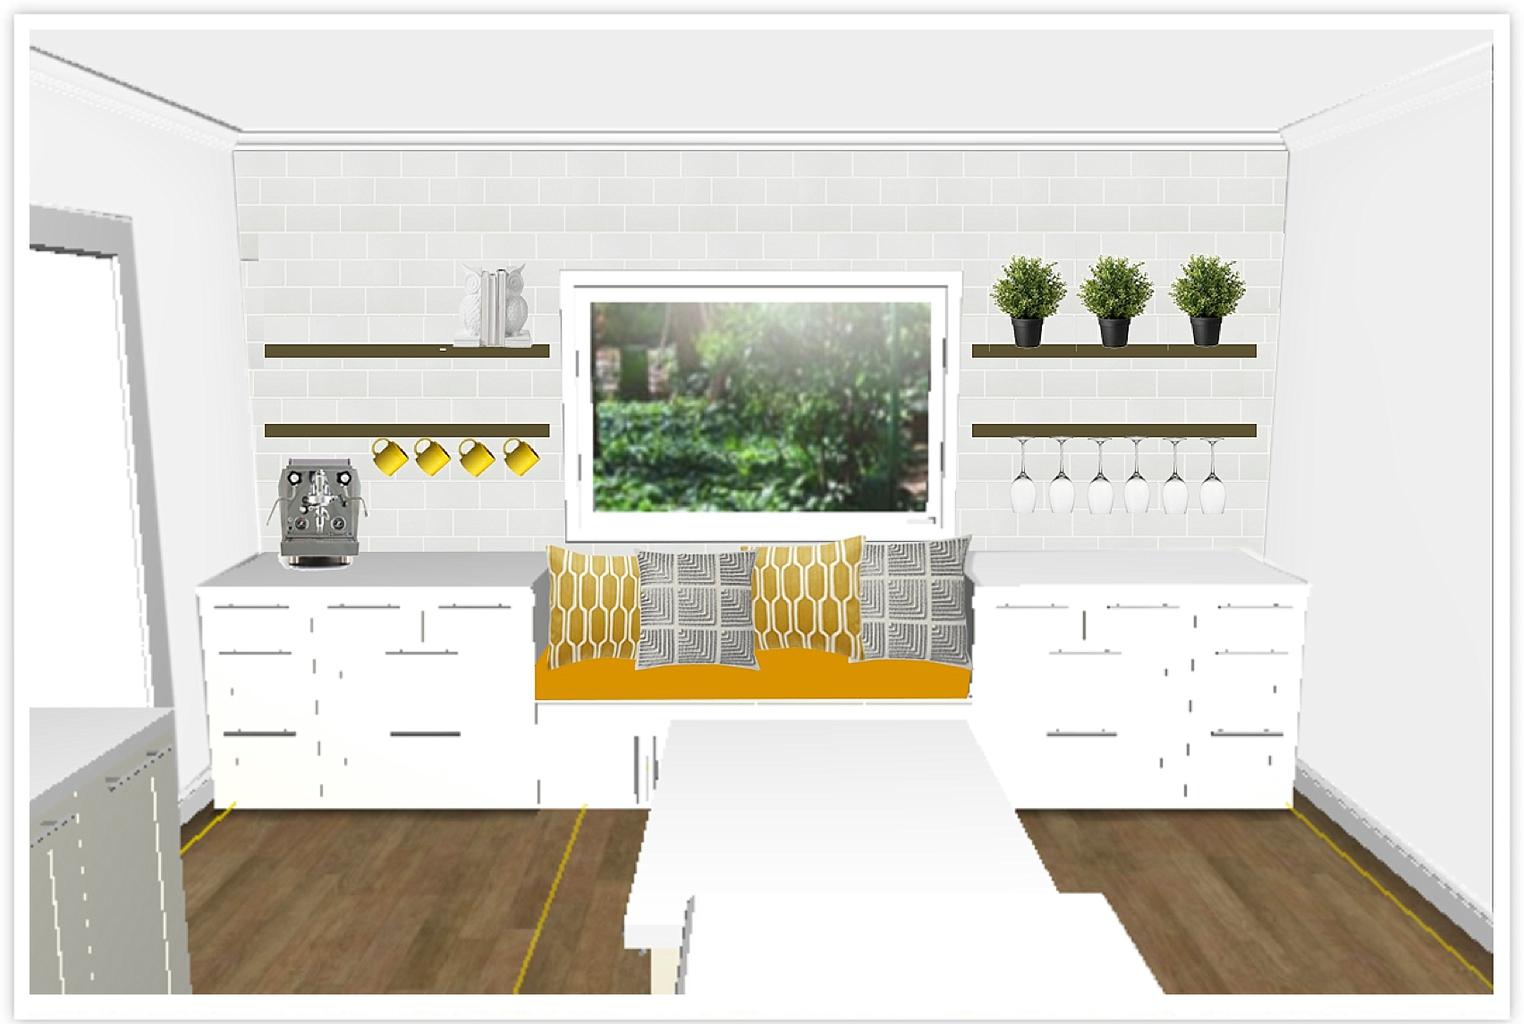 ikea semihandmade kitchen renovation before and after ikea kitchen remodel IKEA Kitchen planner and photoshop mock up